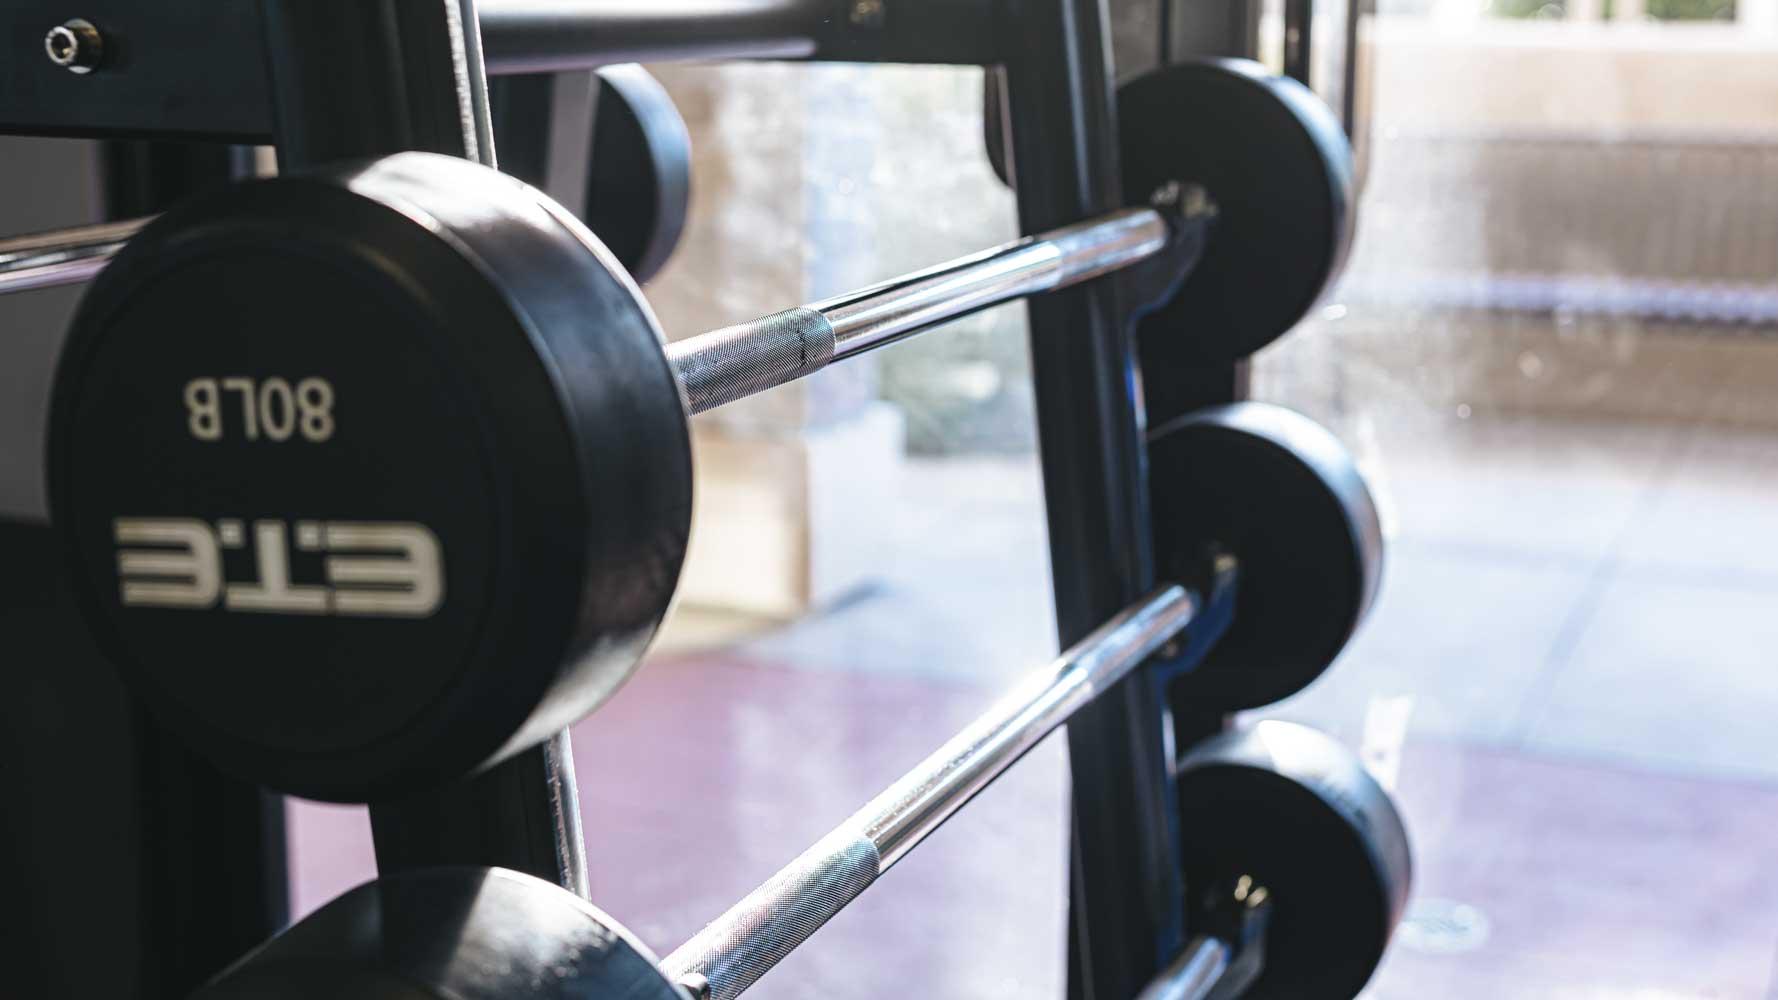 Full-fledged Gym!